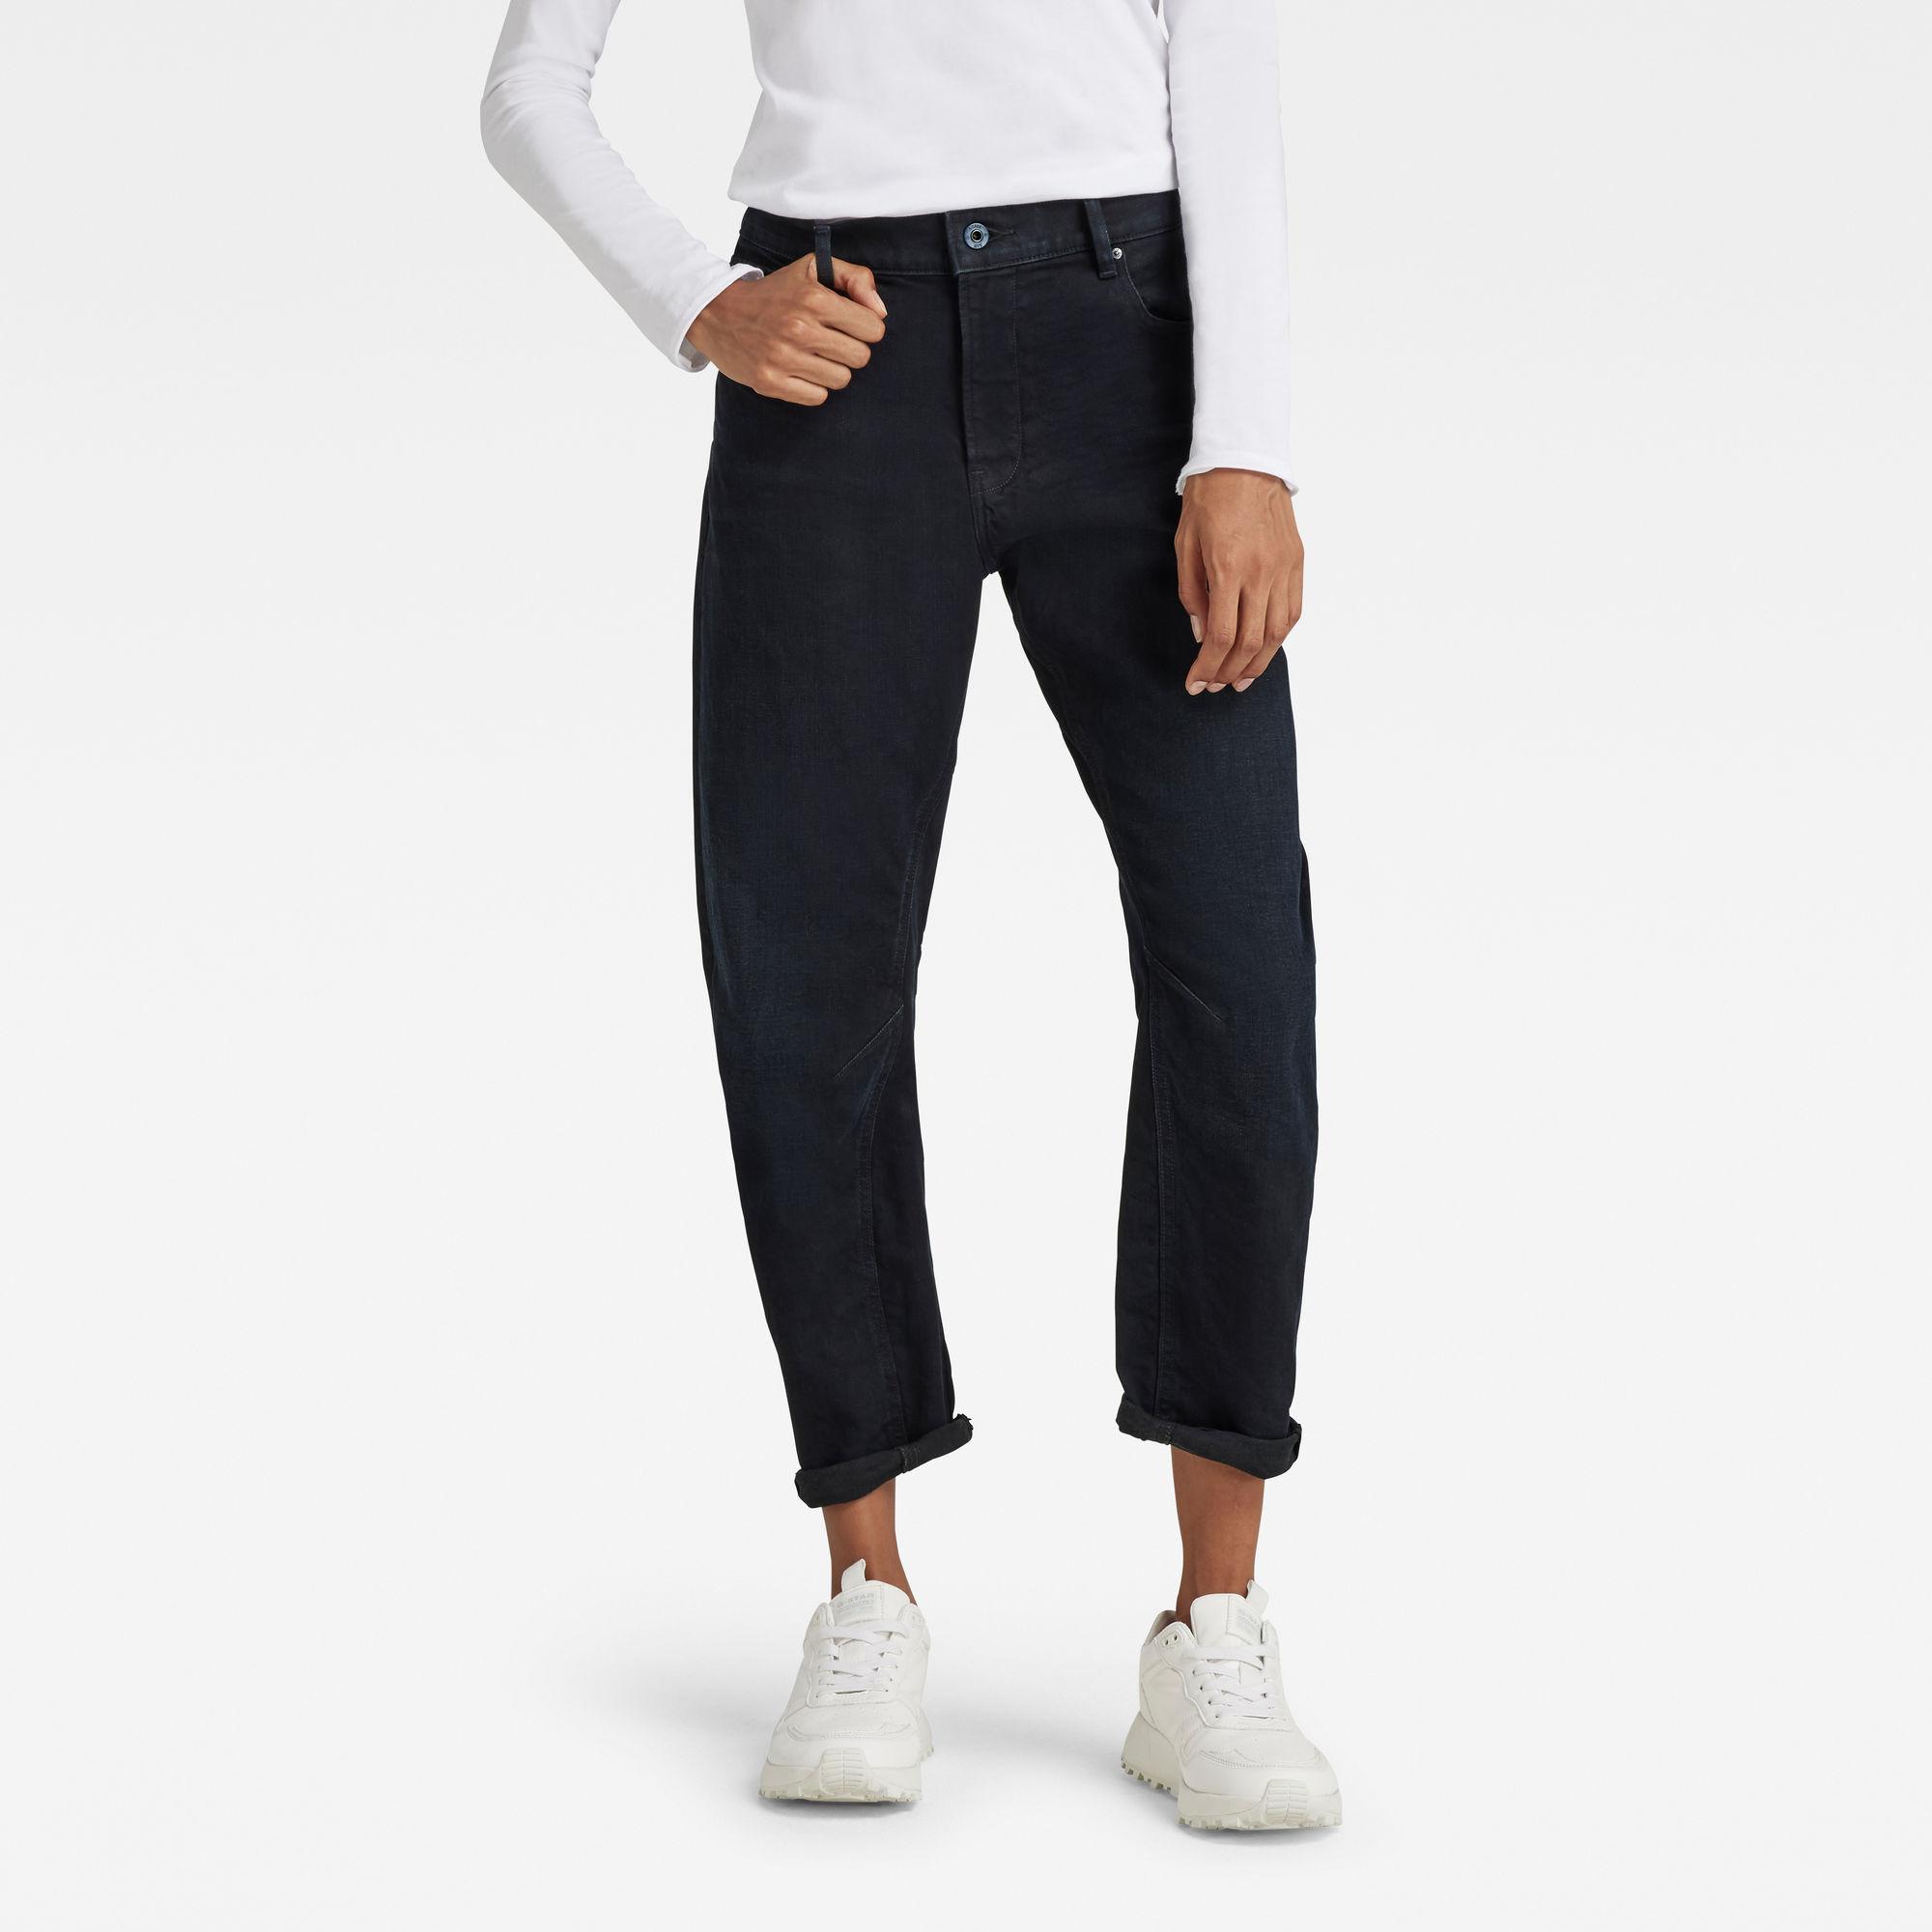 G-Star RAW Dames Arc 3D Boyfriend jeans Donkerblauw